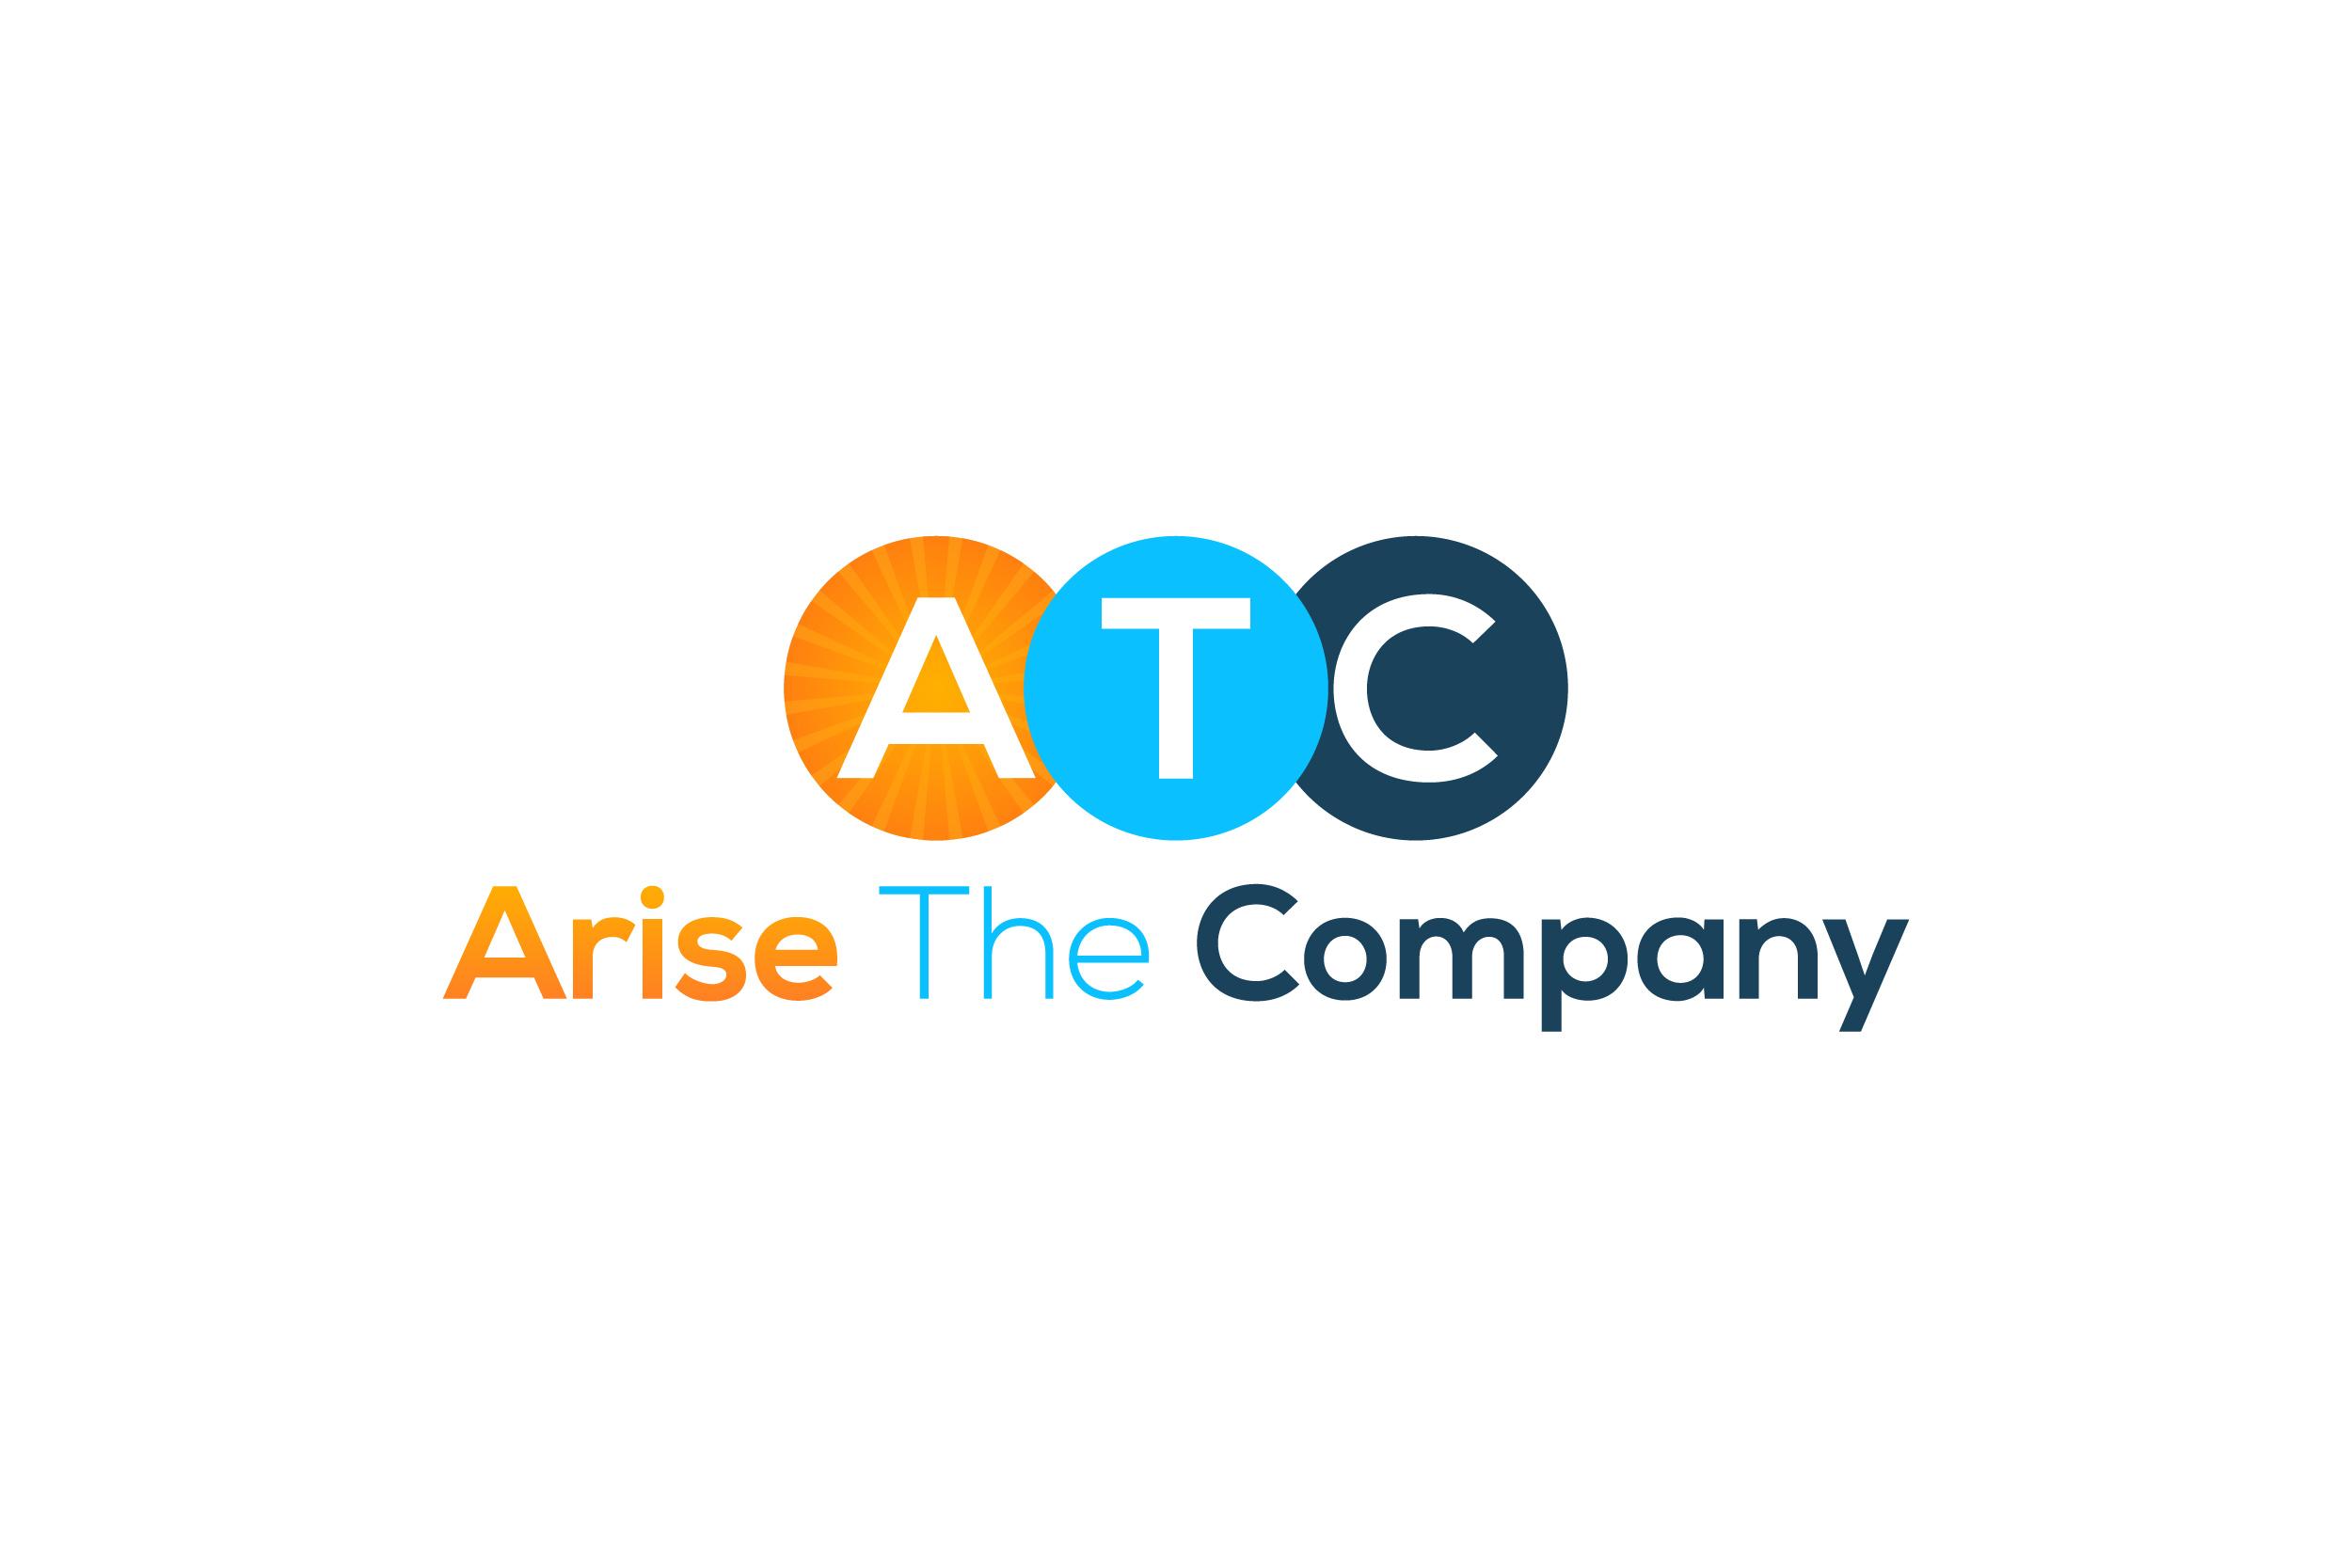 Arise The Company